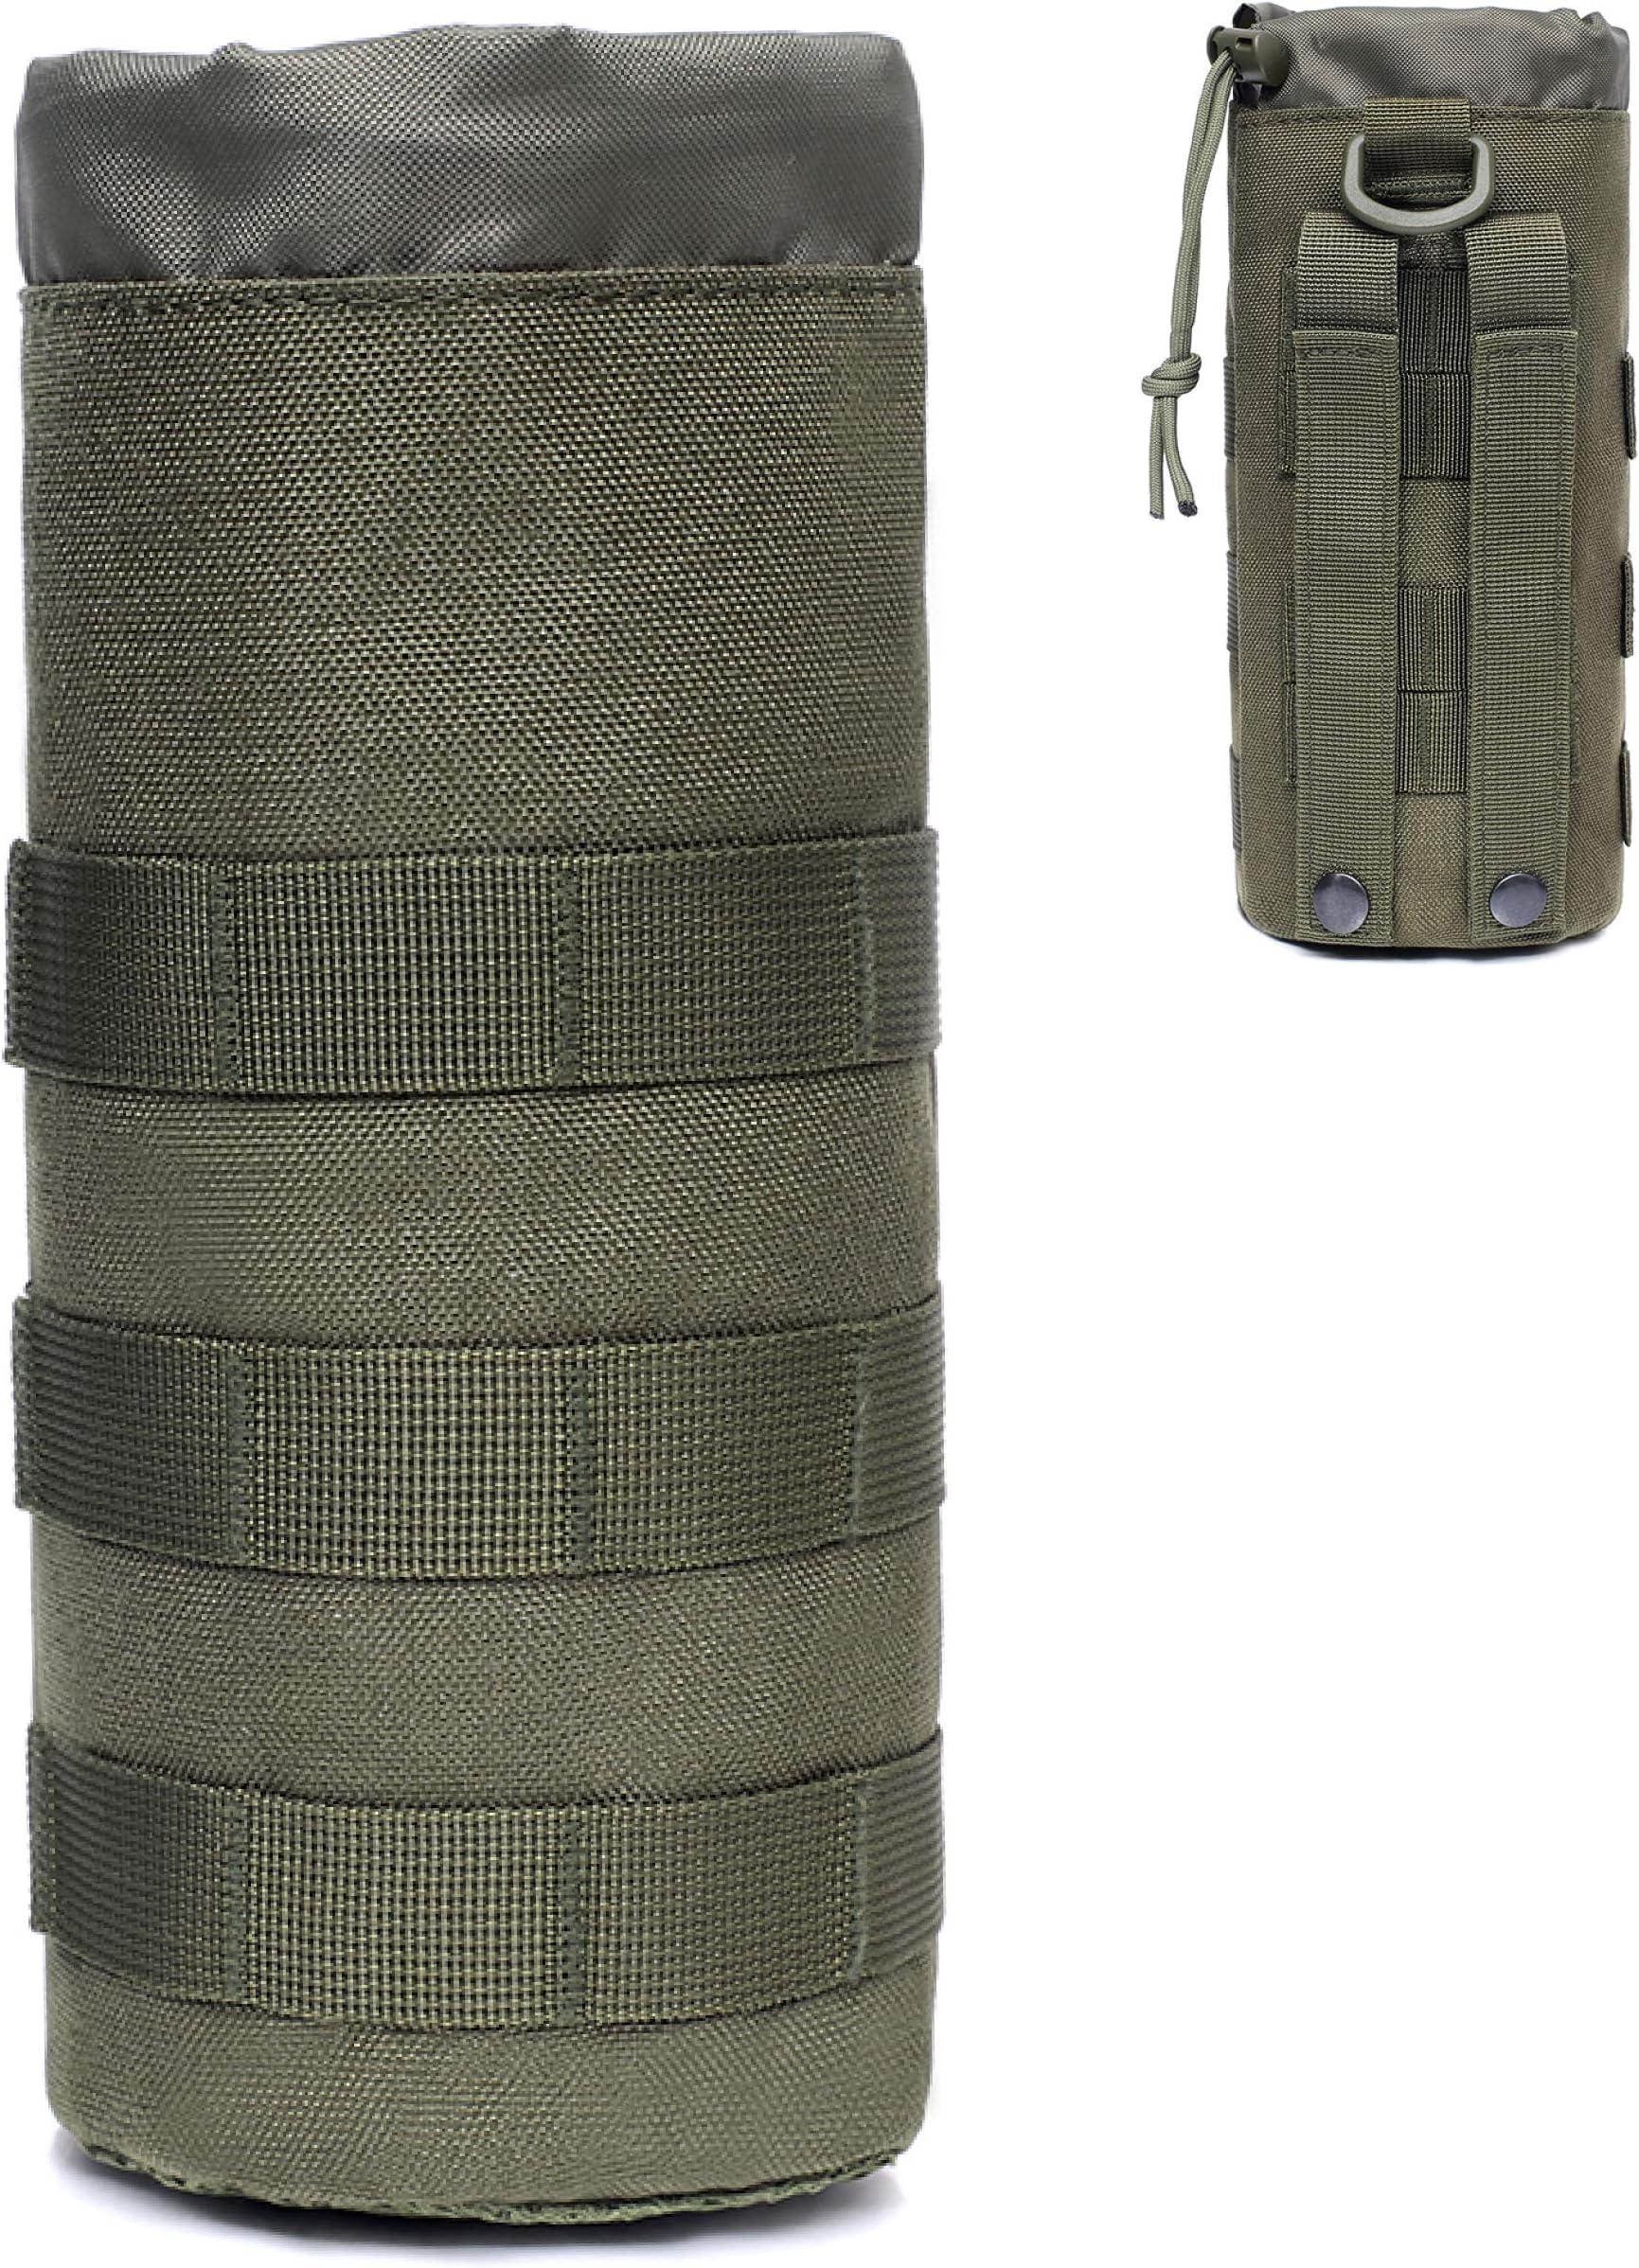 Water Bottle Cooler Cup Bag Carrier Flask Bottles Pouch for All 30oz Bottles